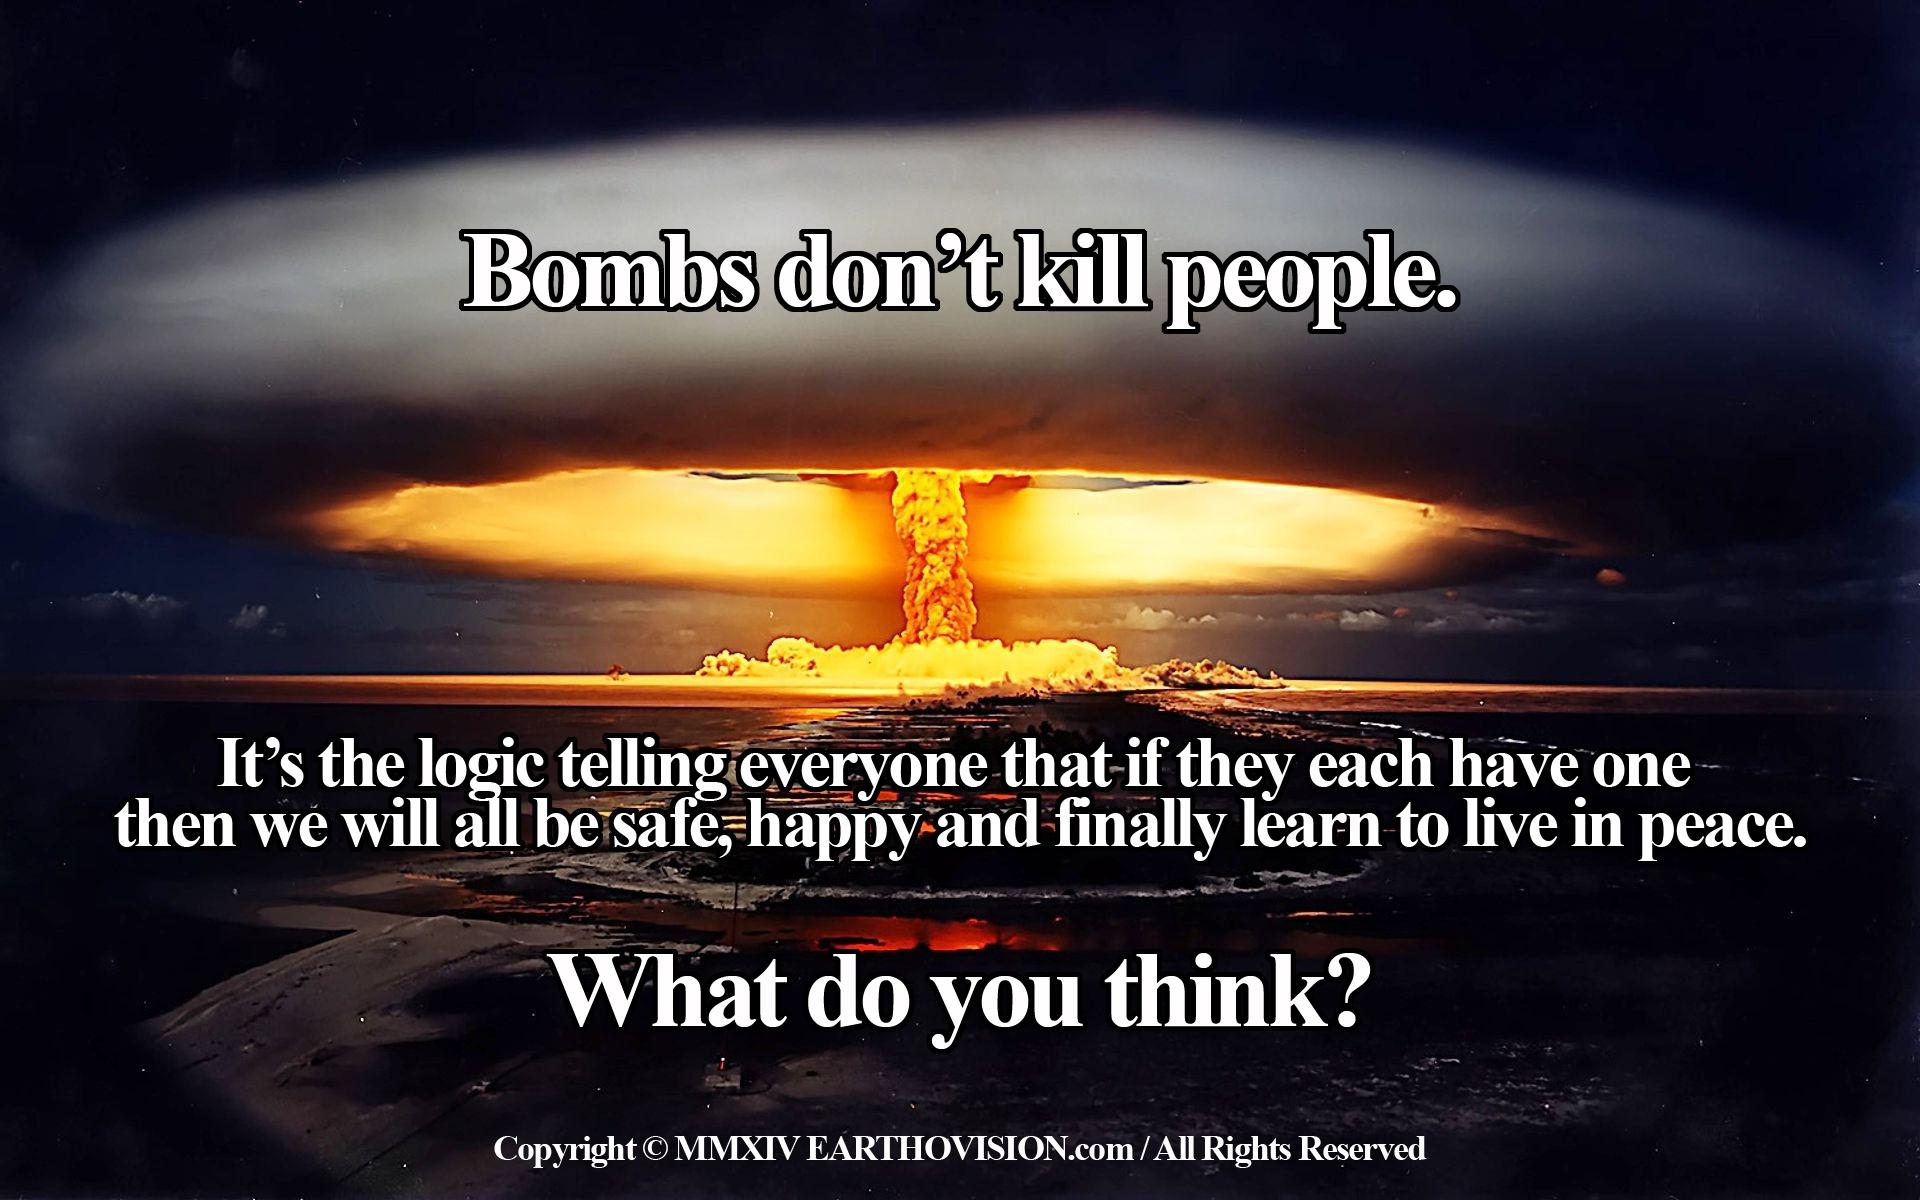 BombsDontKillPeople01